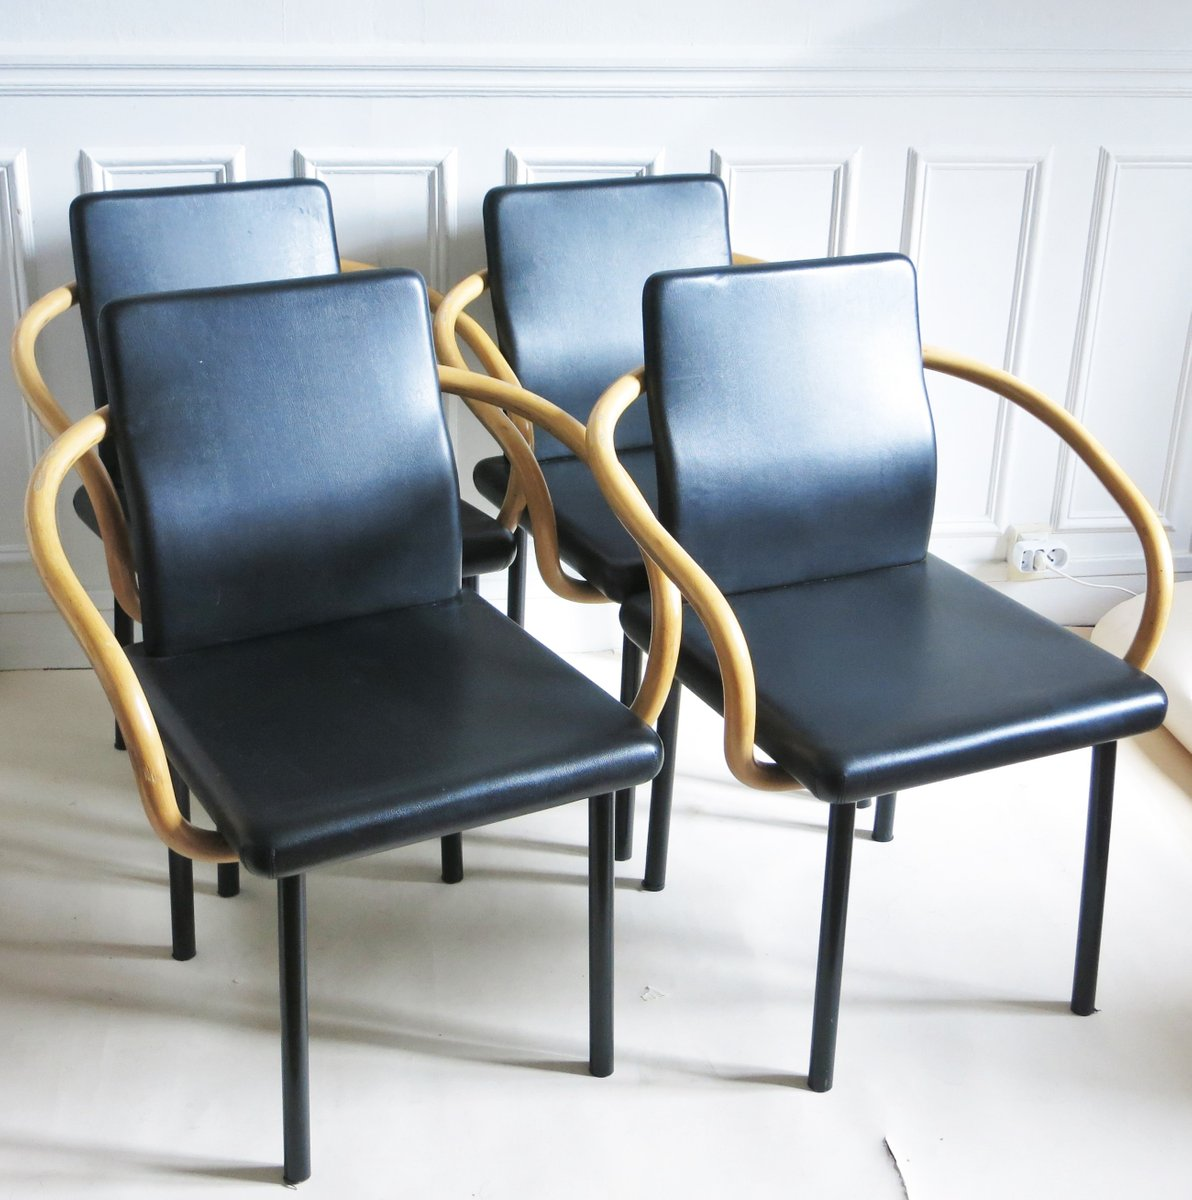 mundarin st hle von ettore sottsass f r knoll 1980er 4er set bei pamono kaufen. Black Bedroom Furniture Sets. Home Design Ideas